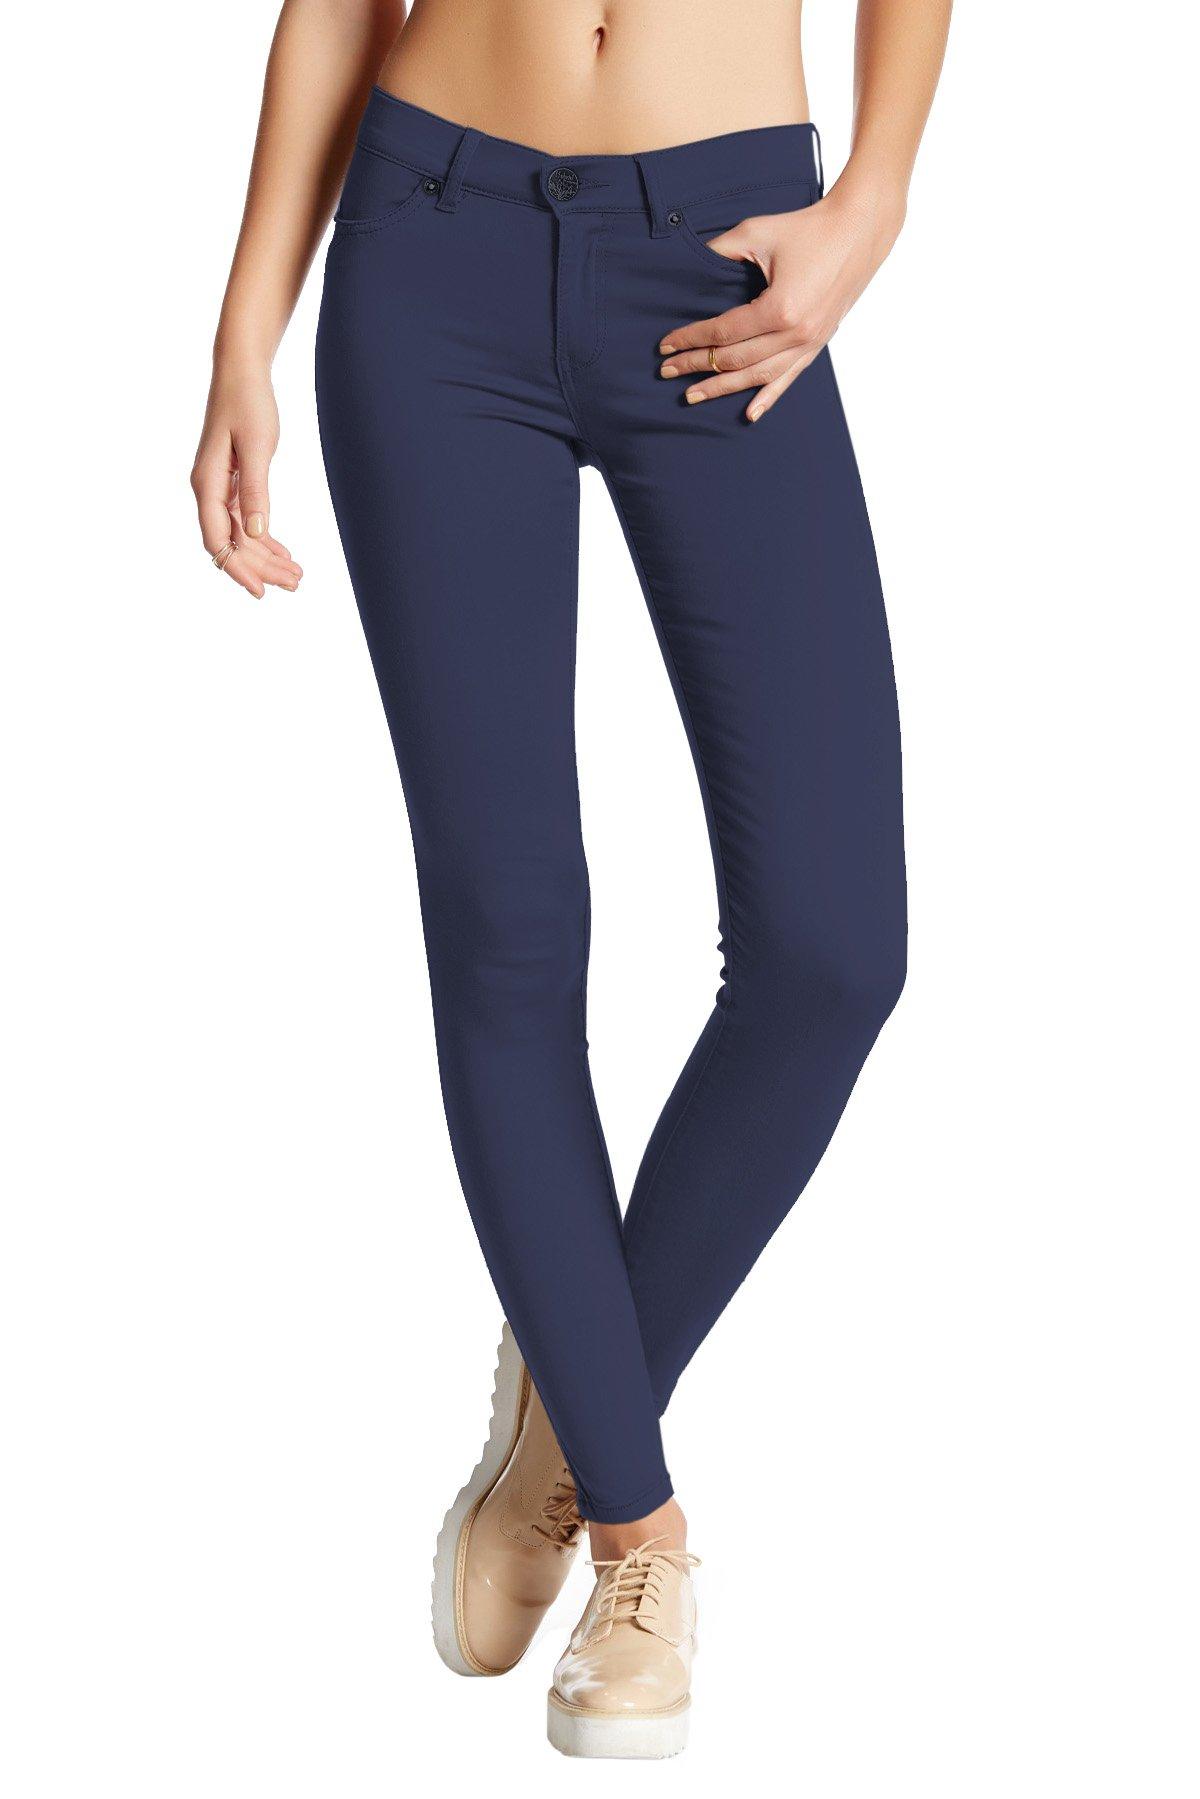 HyBrid & Company Womens Super Stretch Comfy Skinny Pants P44876SK Navy Large